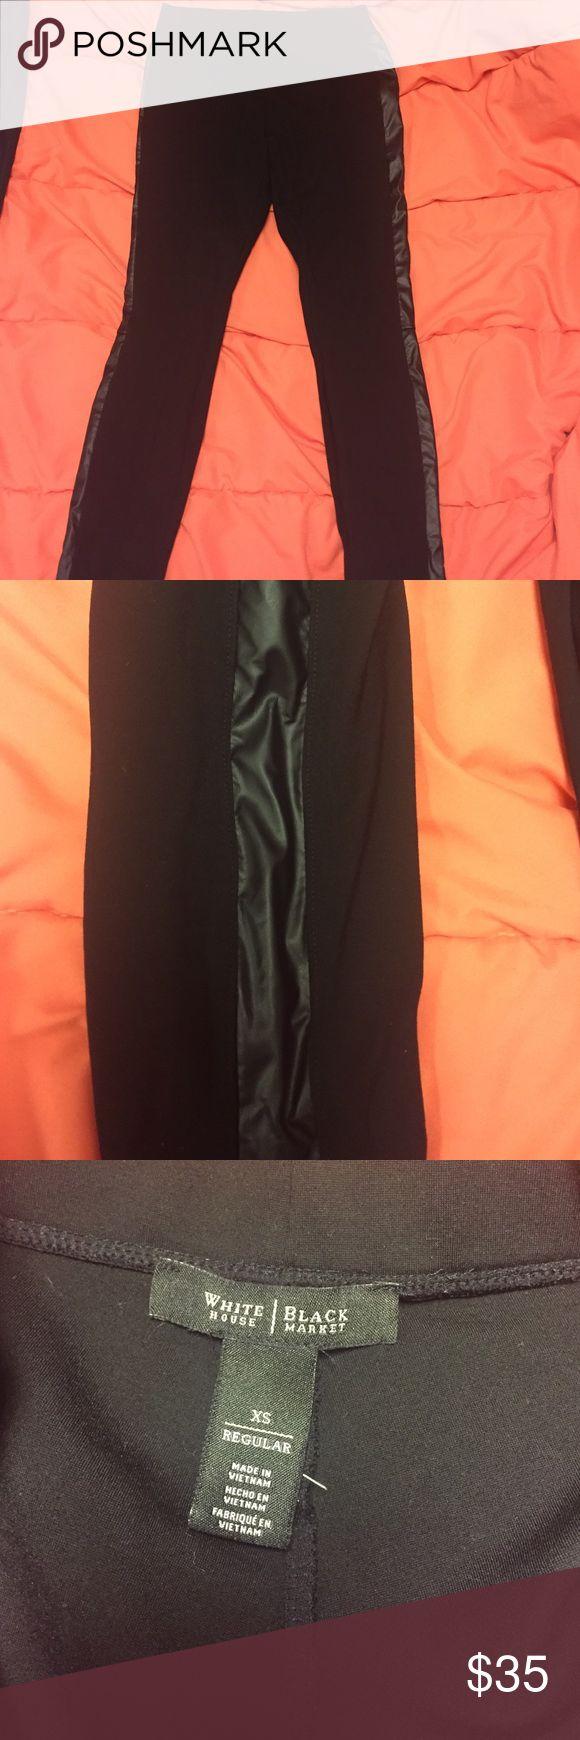 Dress Leggings Thick black leggings with faux leather strip down center. Dress them up or down! White House Black Market Pants Leggings